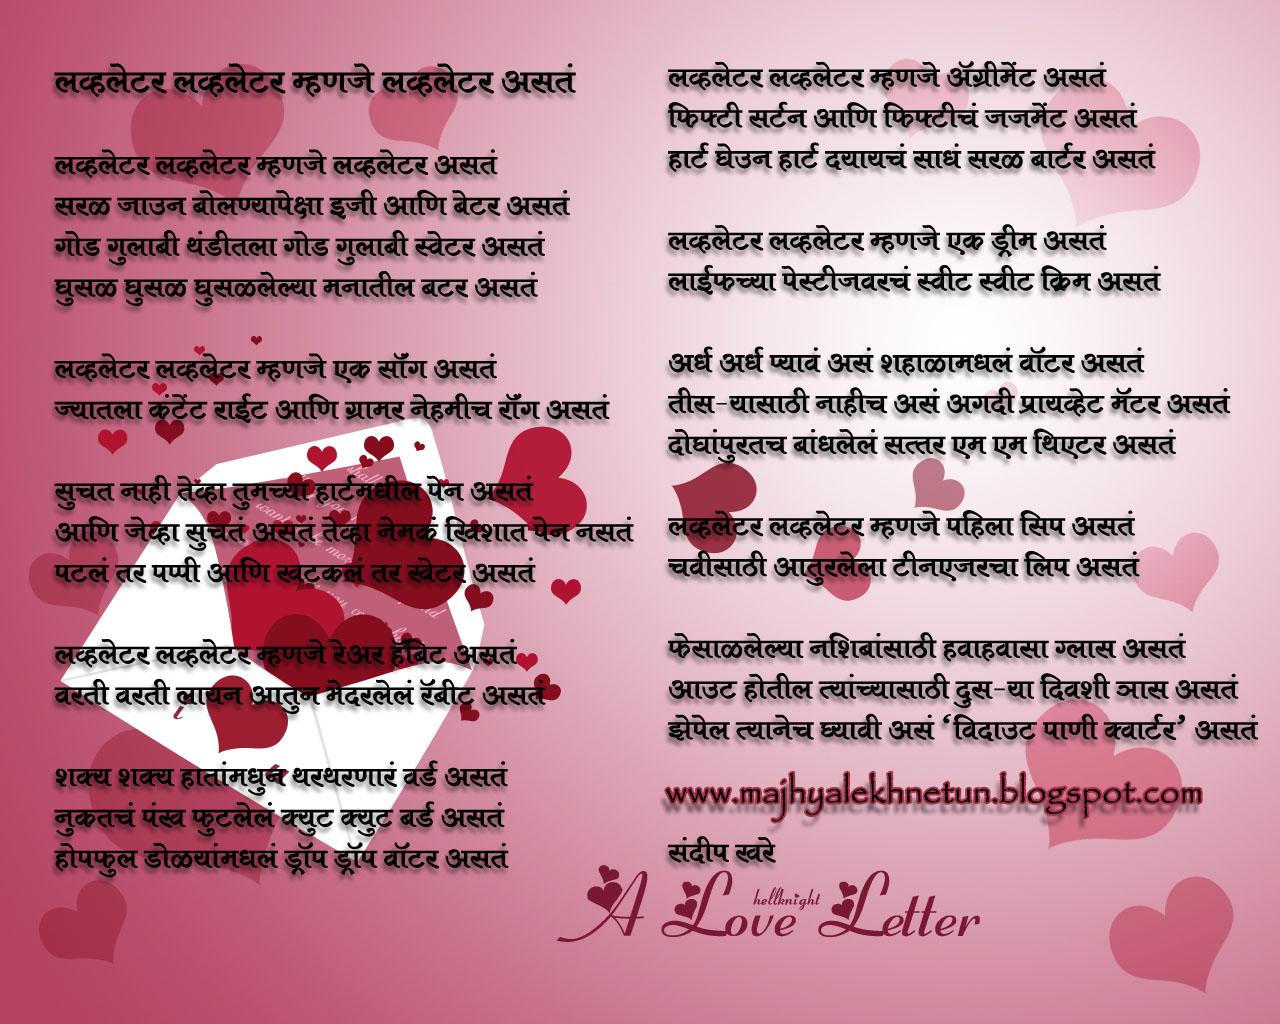 Love letter for her in marathi love letter marathi girlfriend spiritdancerdesigns Gallery